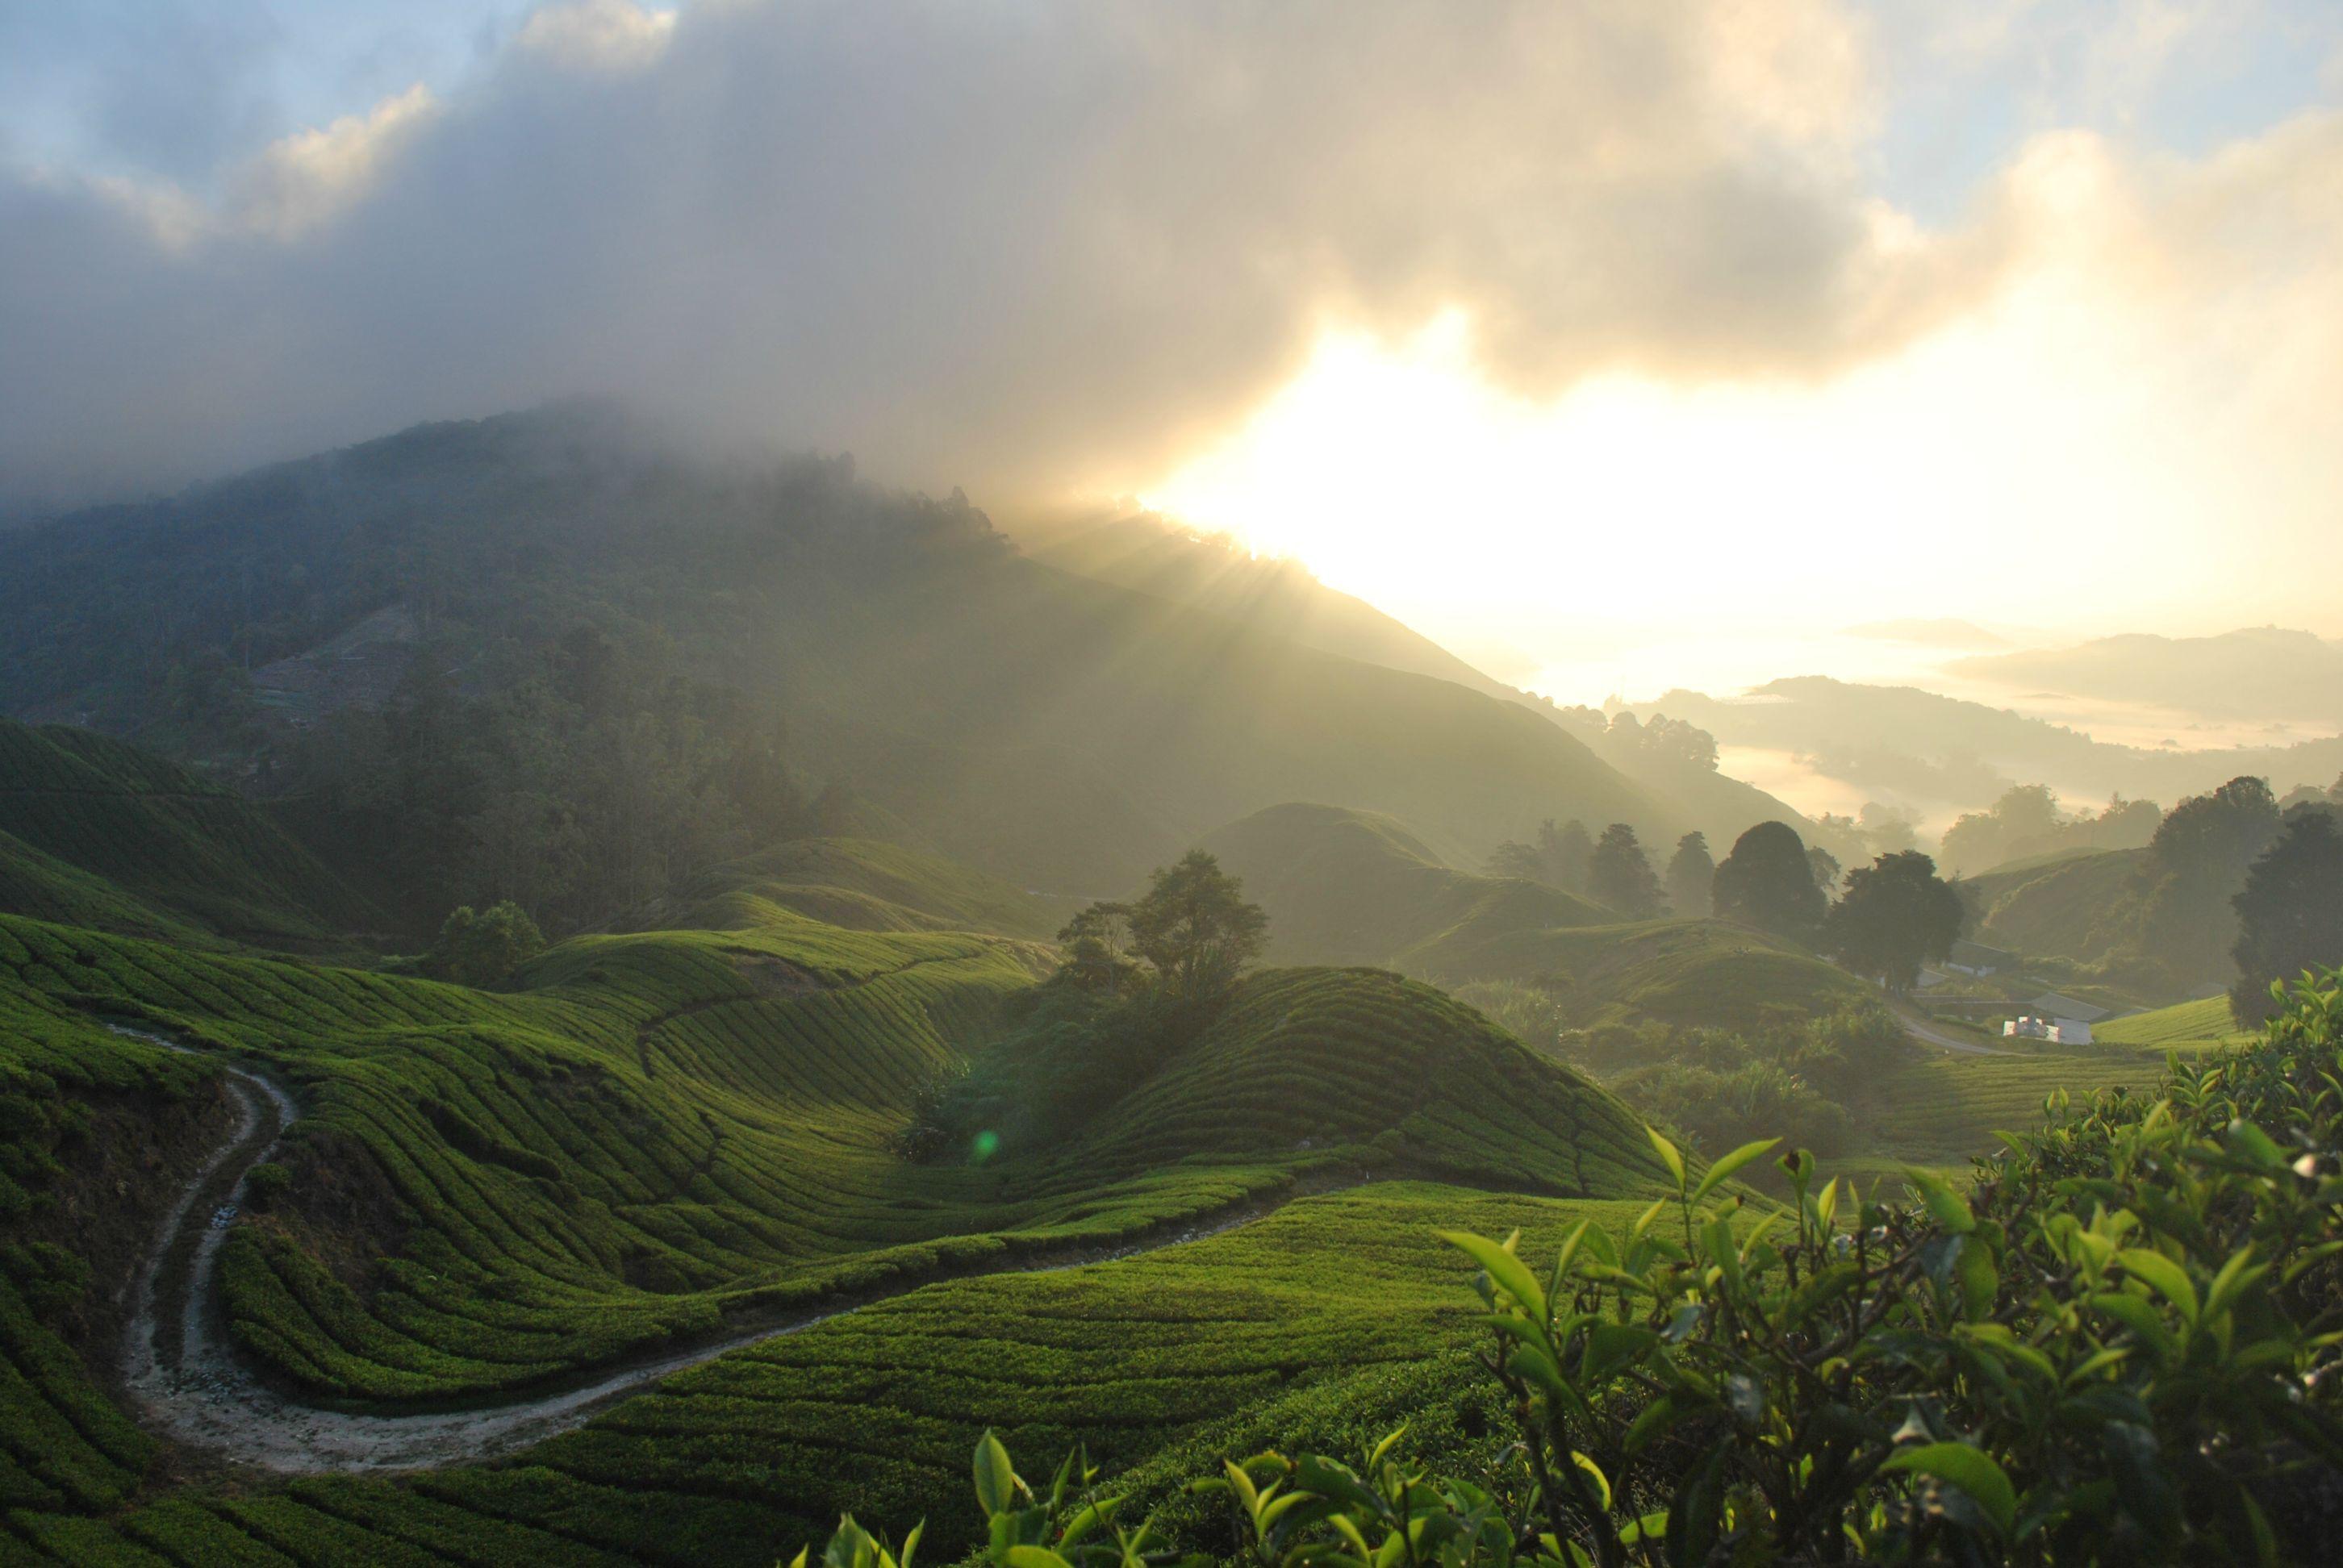 Unedited sunrise in the Cameron Highlands of Malaysia [OC] [3872 x 2592]